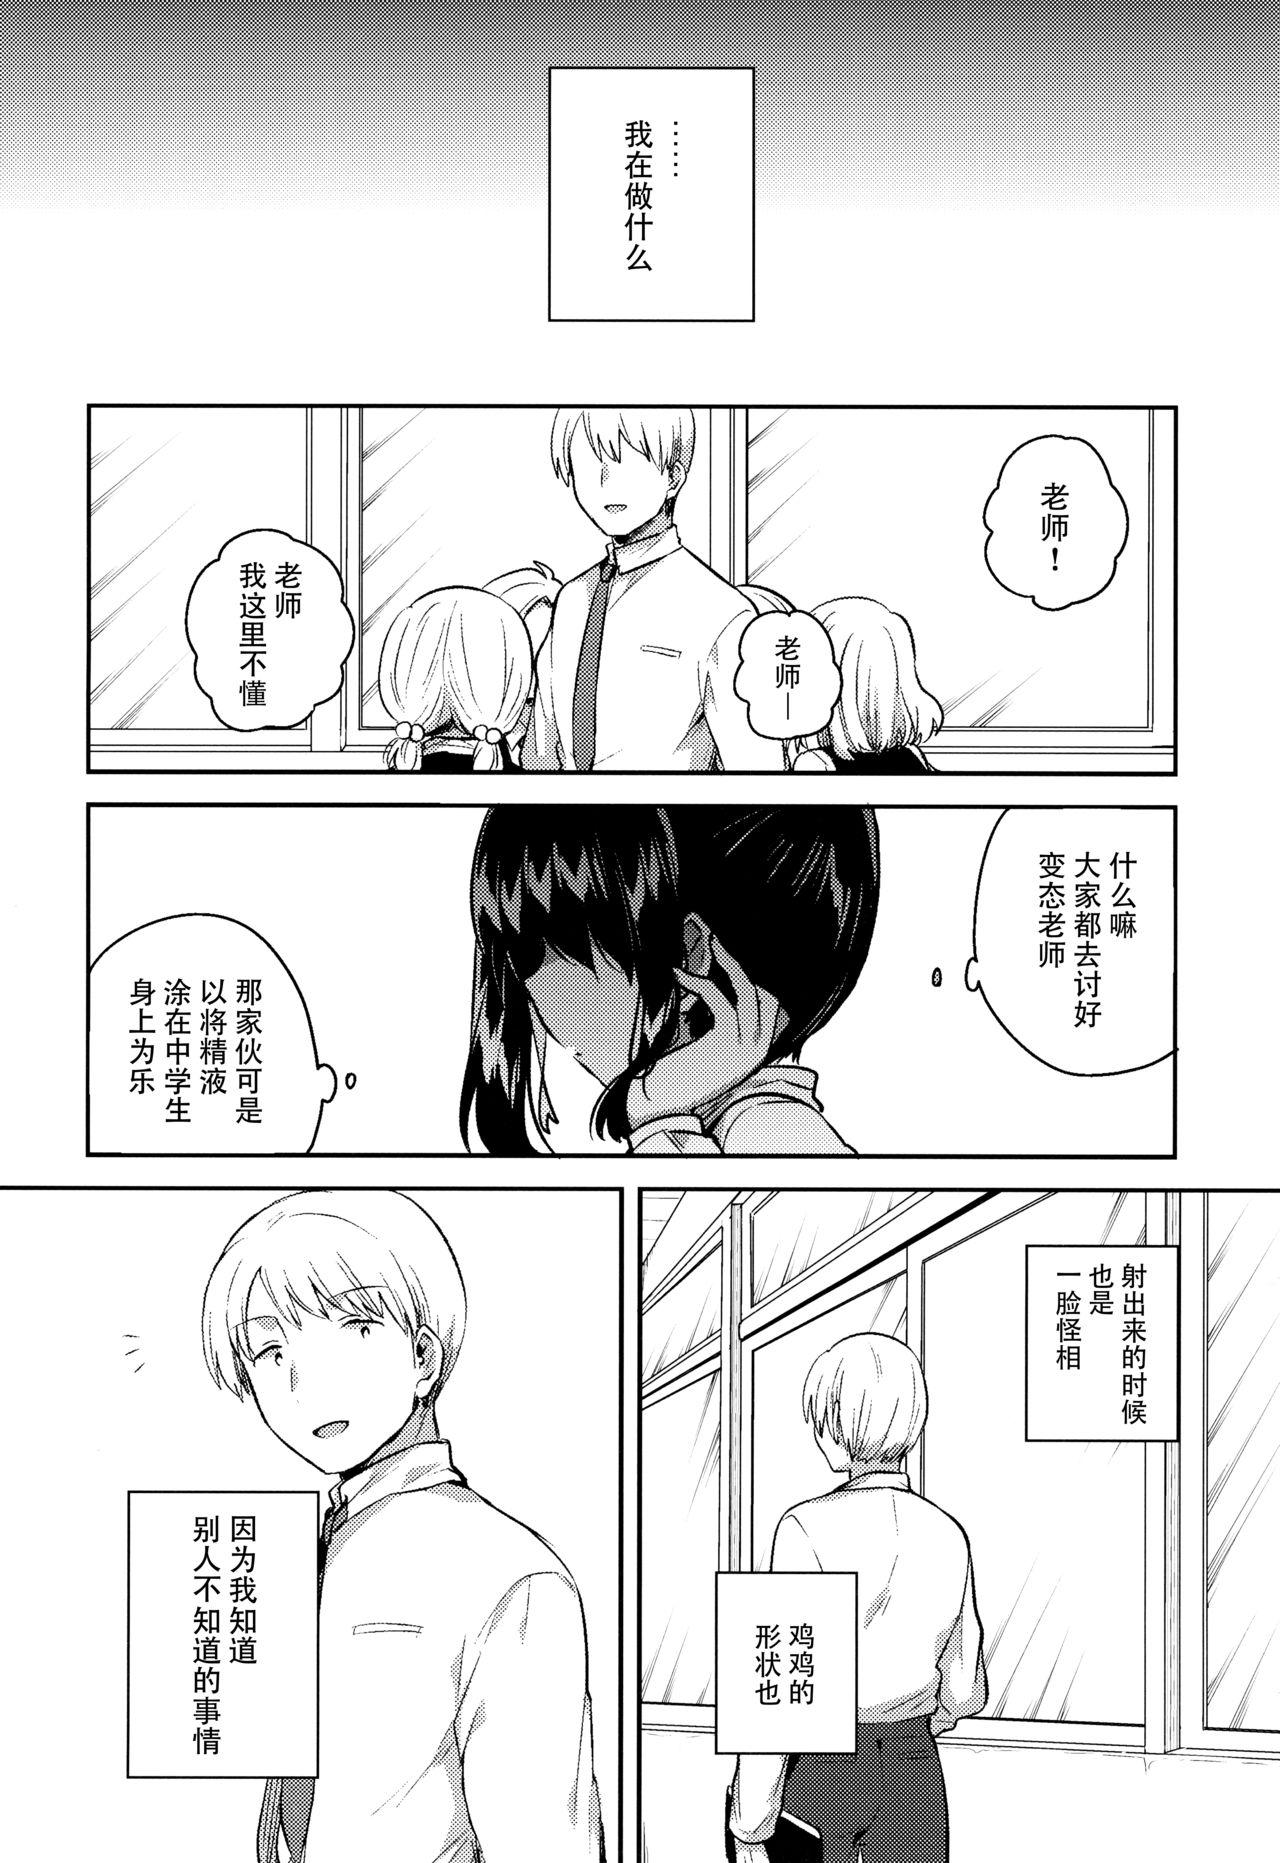 (SC2018 Spring) [squeezecandyheaven (Ichihaya)] Sensei wa Lolicon de Saitei Hentai no Gomikuzu [Zen] + Omake [Chinese] [脸肿汉化组] 23